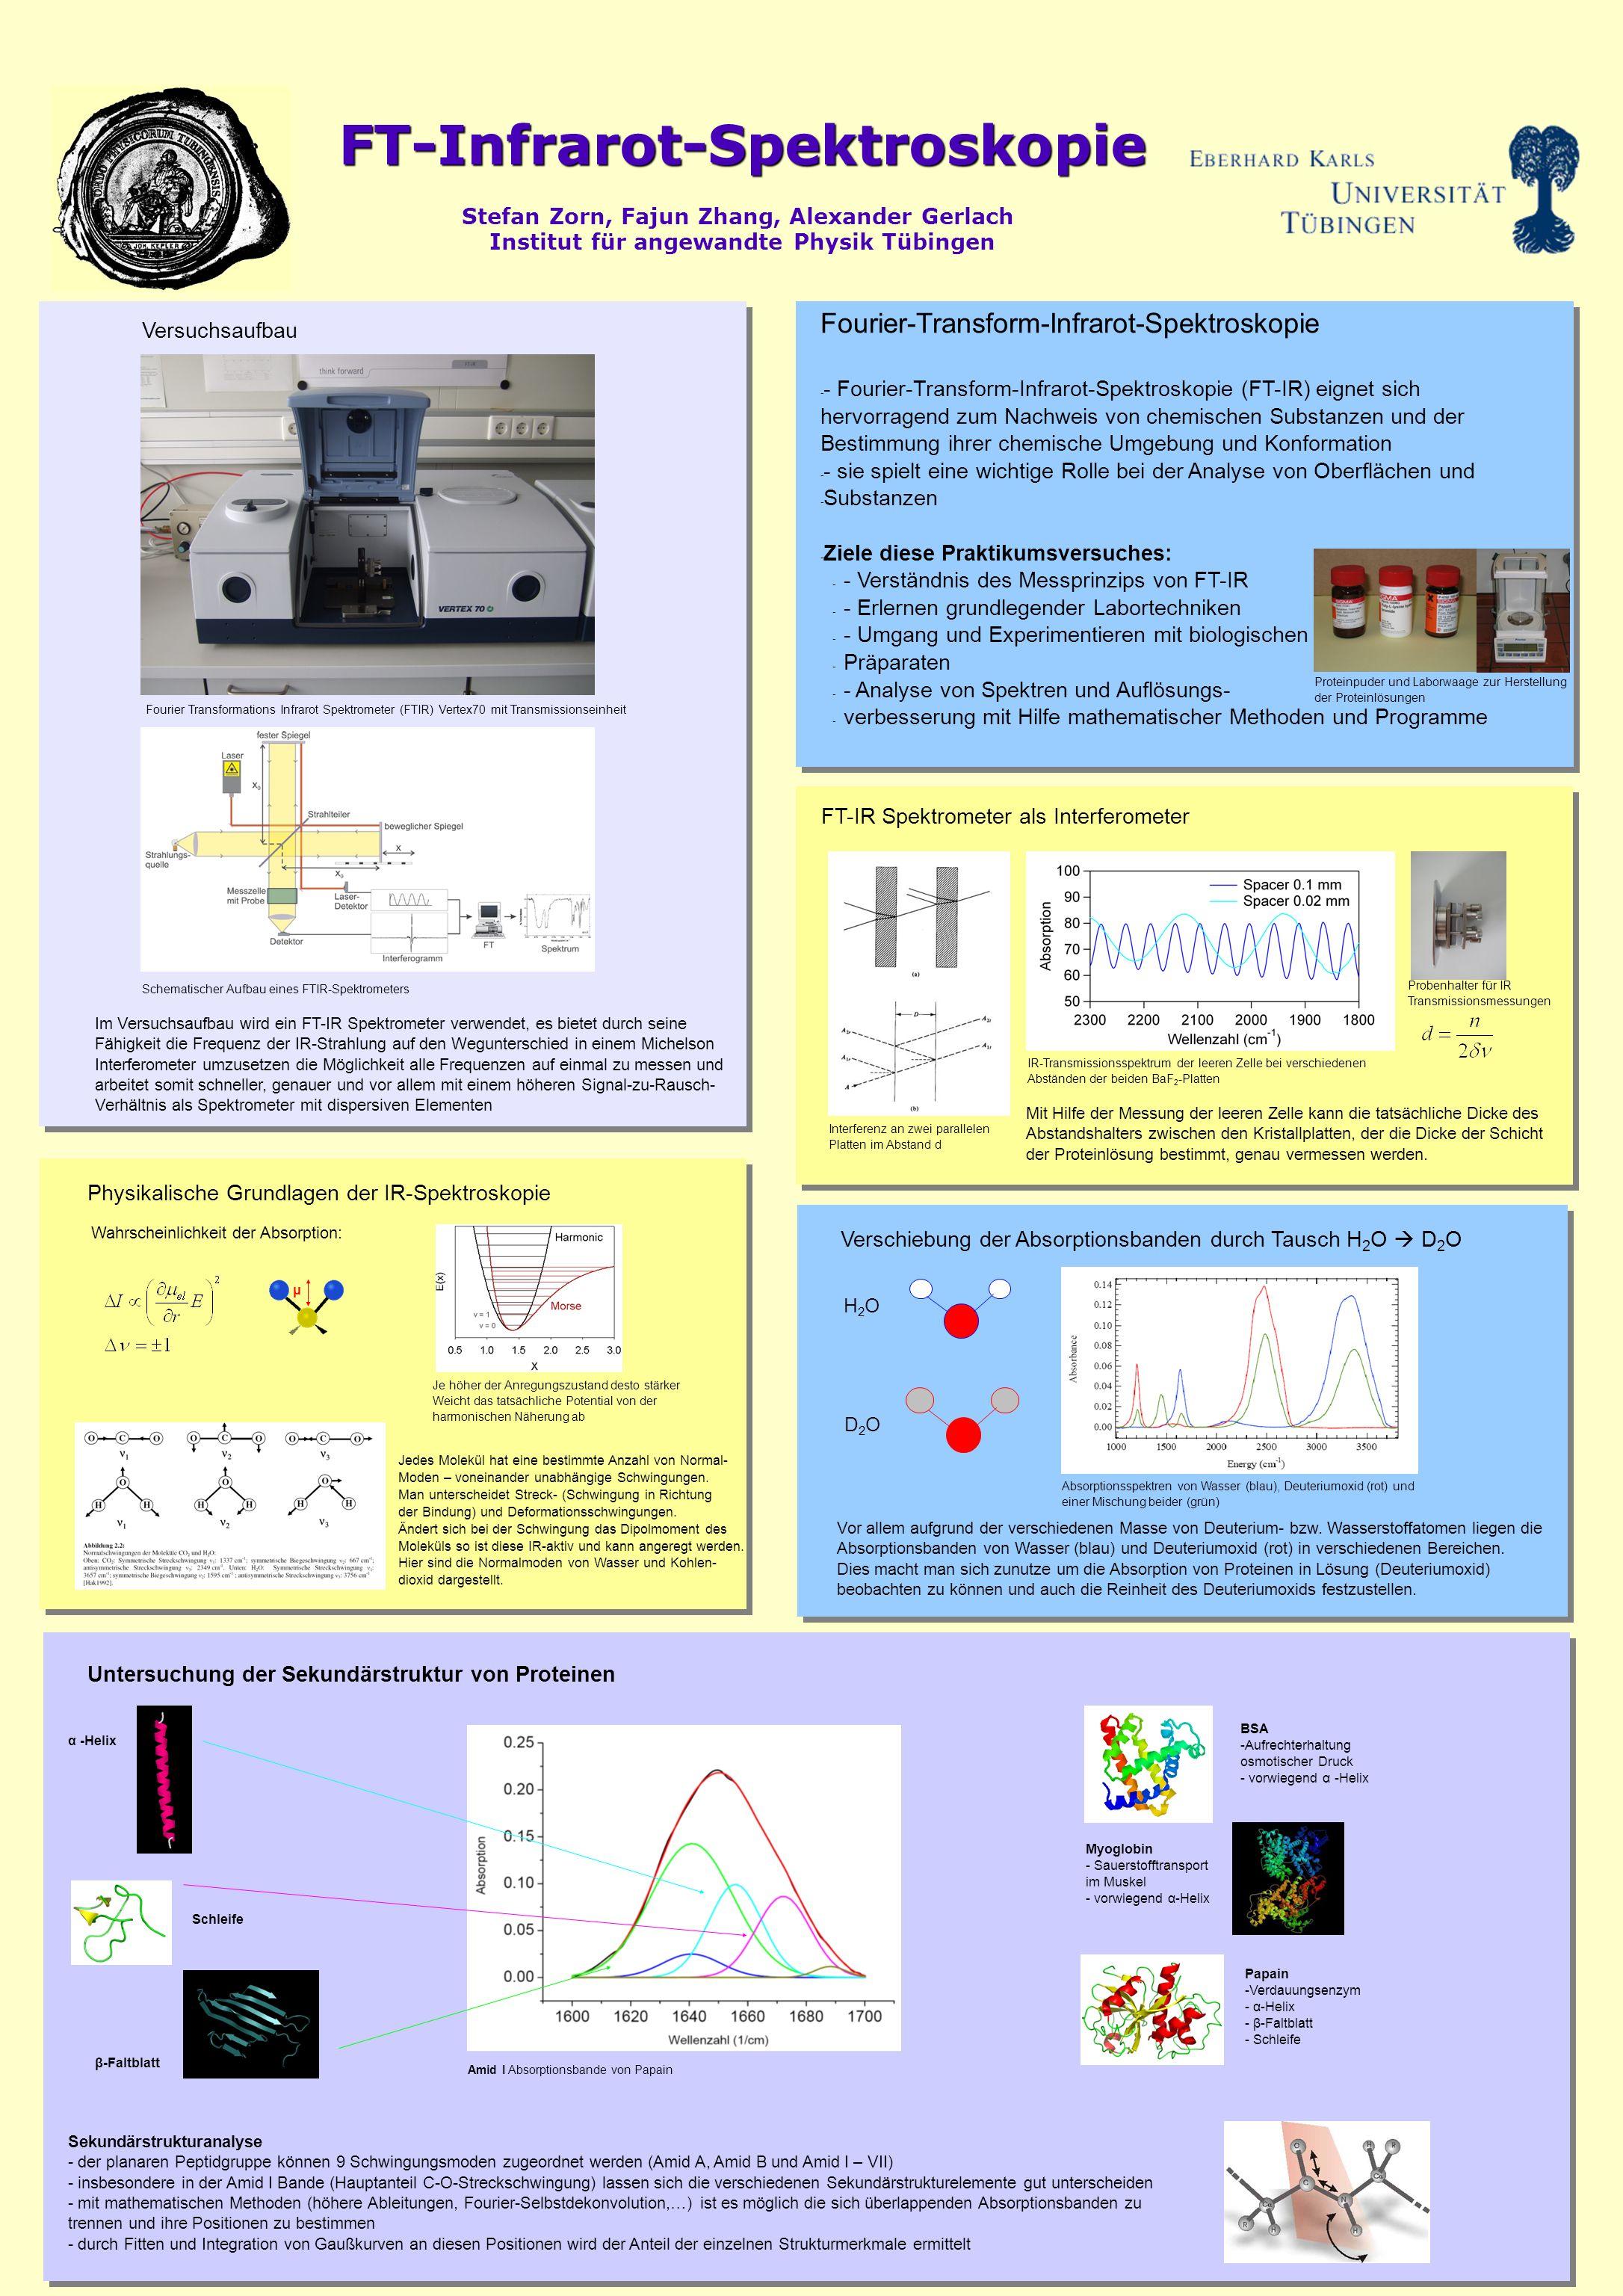 FT-Infrarot-Spektroskopie